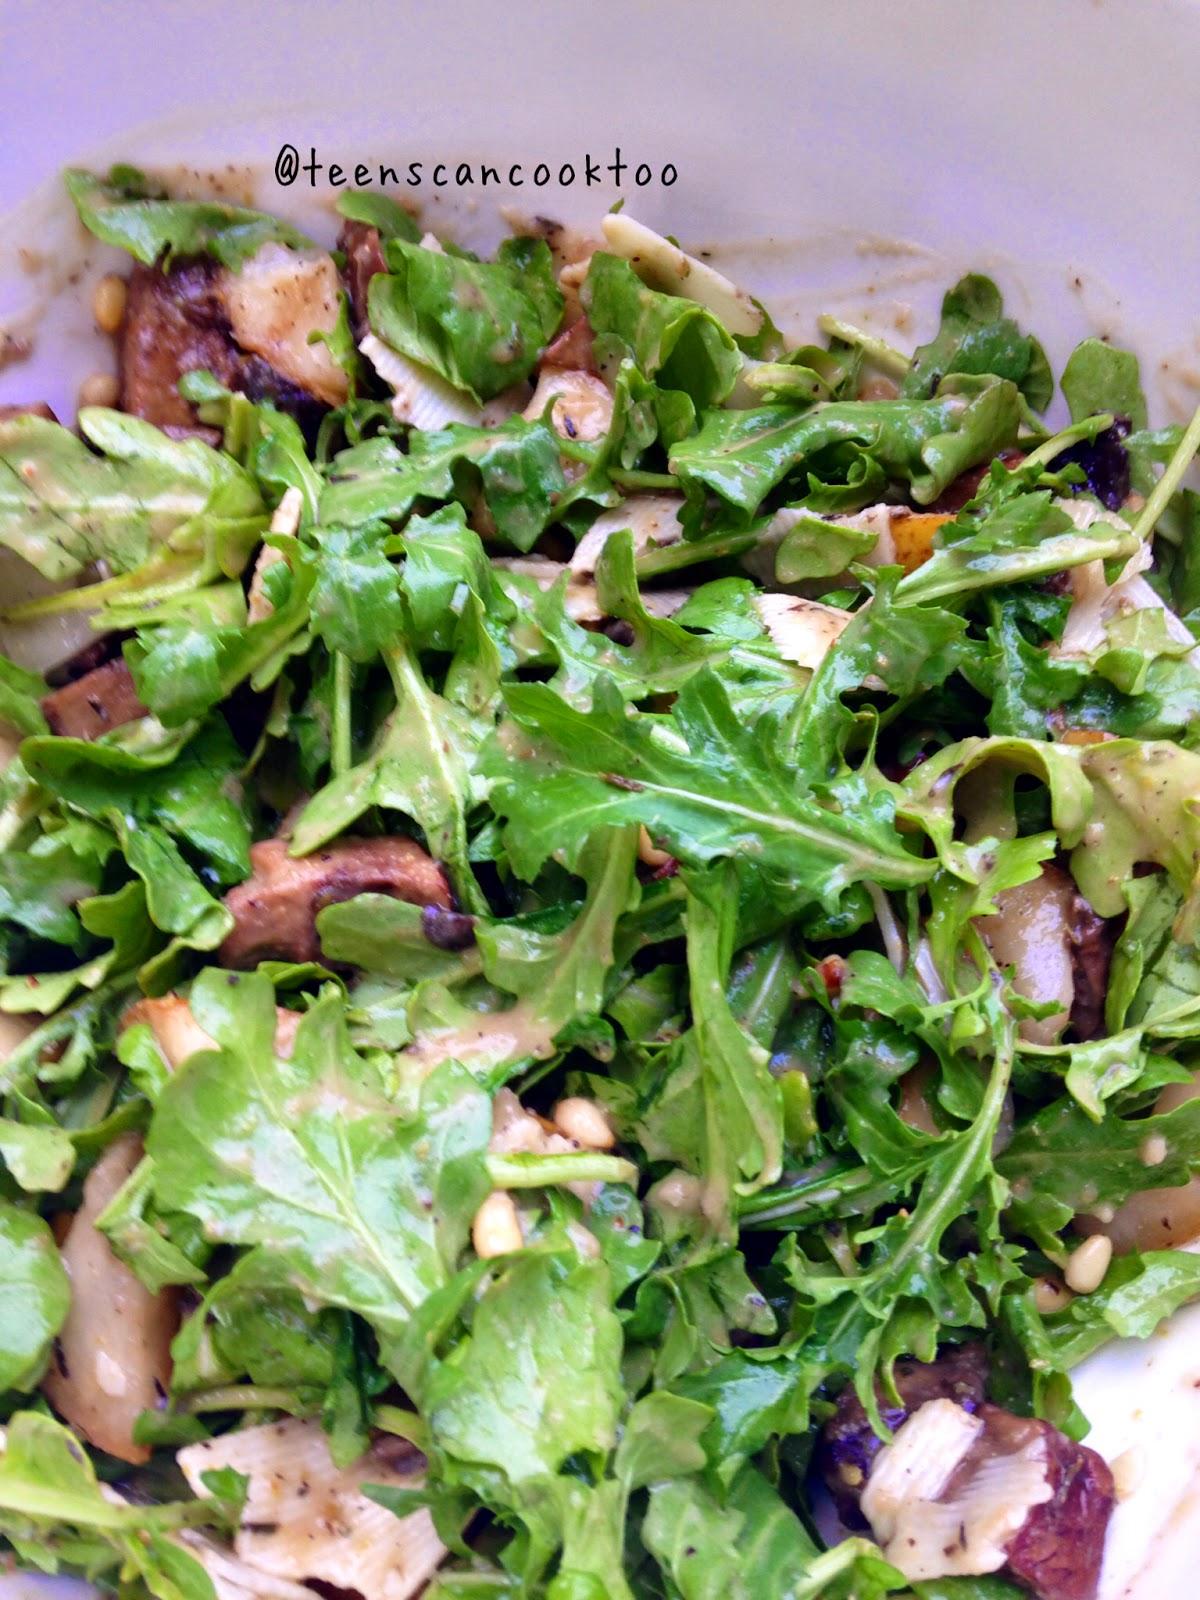 Warm Arugula Salad with Portobello Mushrooms and Pears